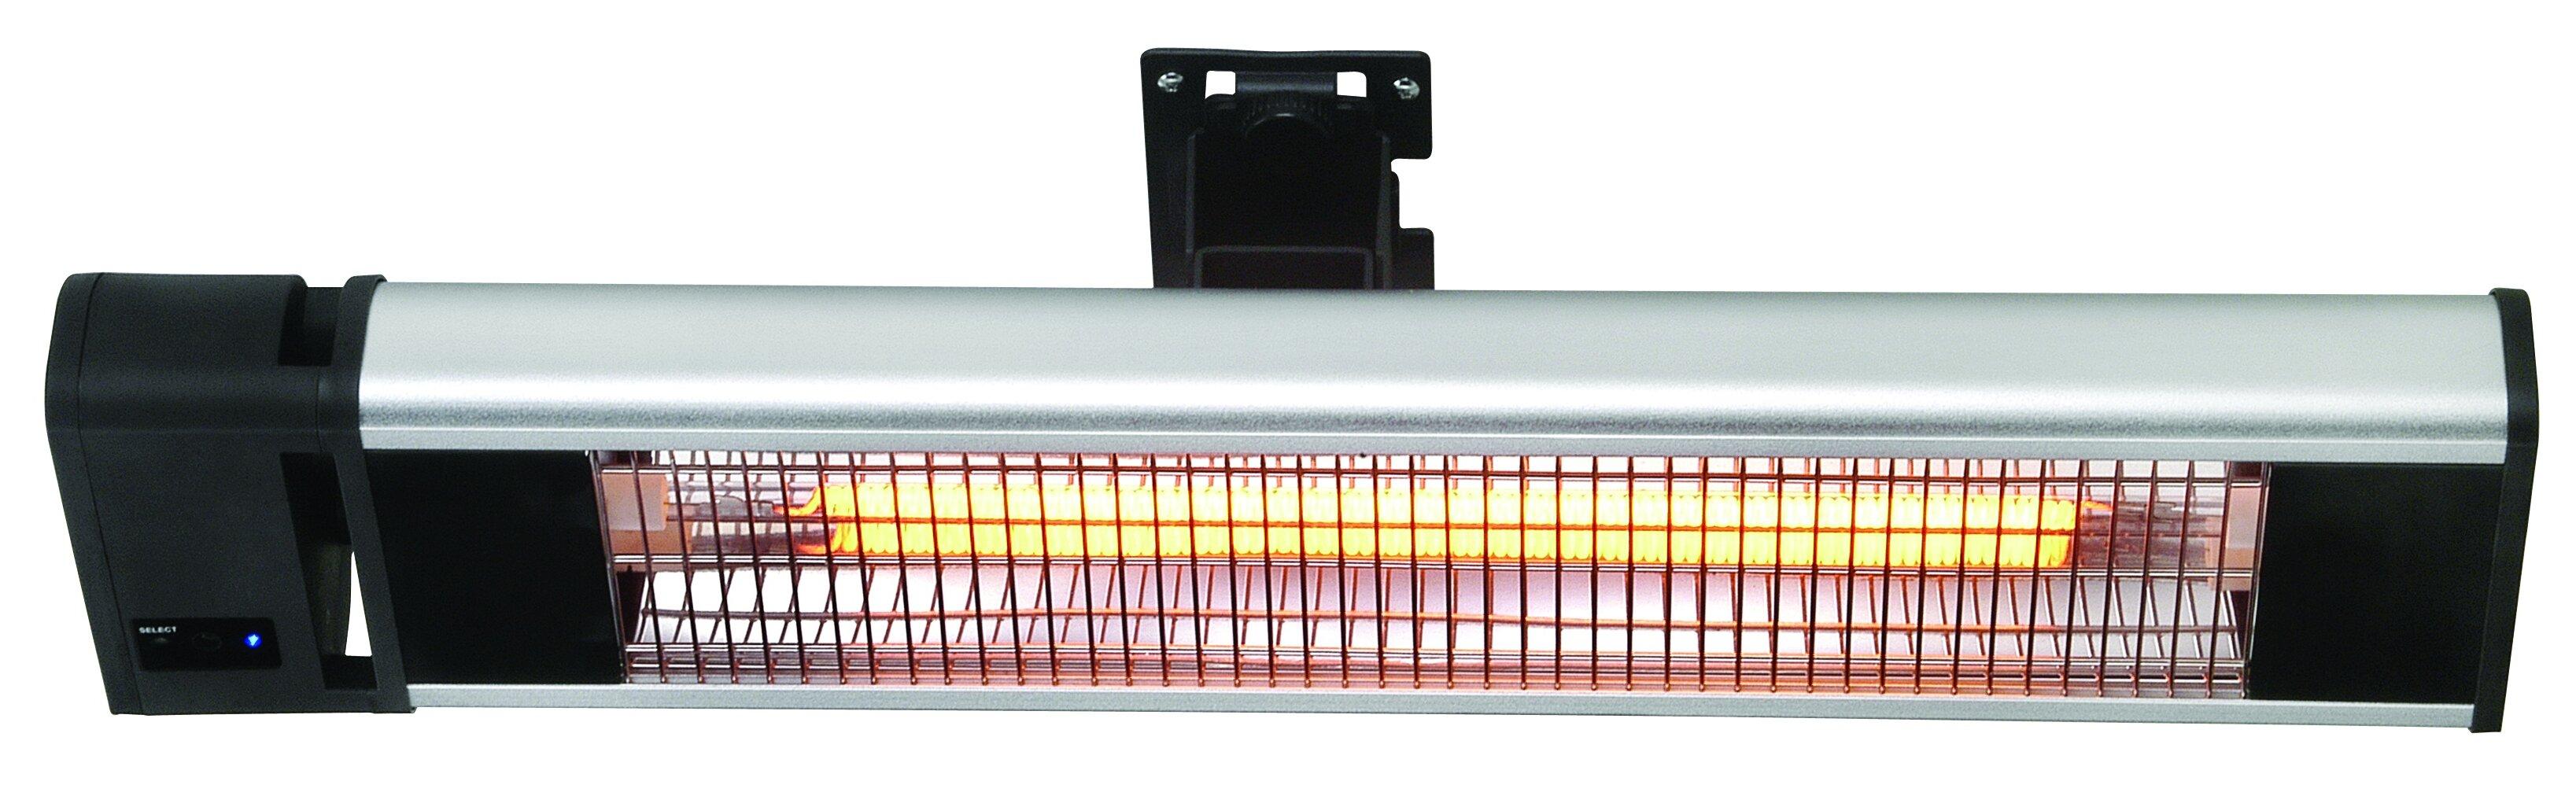 Genial Hetr Wall/Ceiling Mounted 1500 Watt Electric Mounted Patio Heater U0026 Reviews  | Wayfair